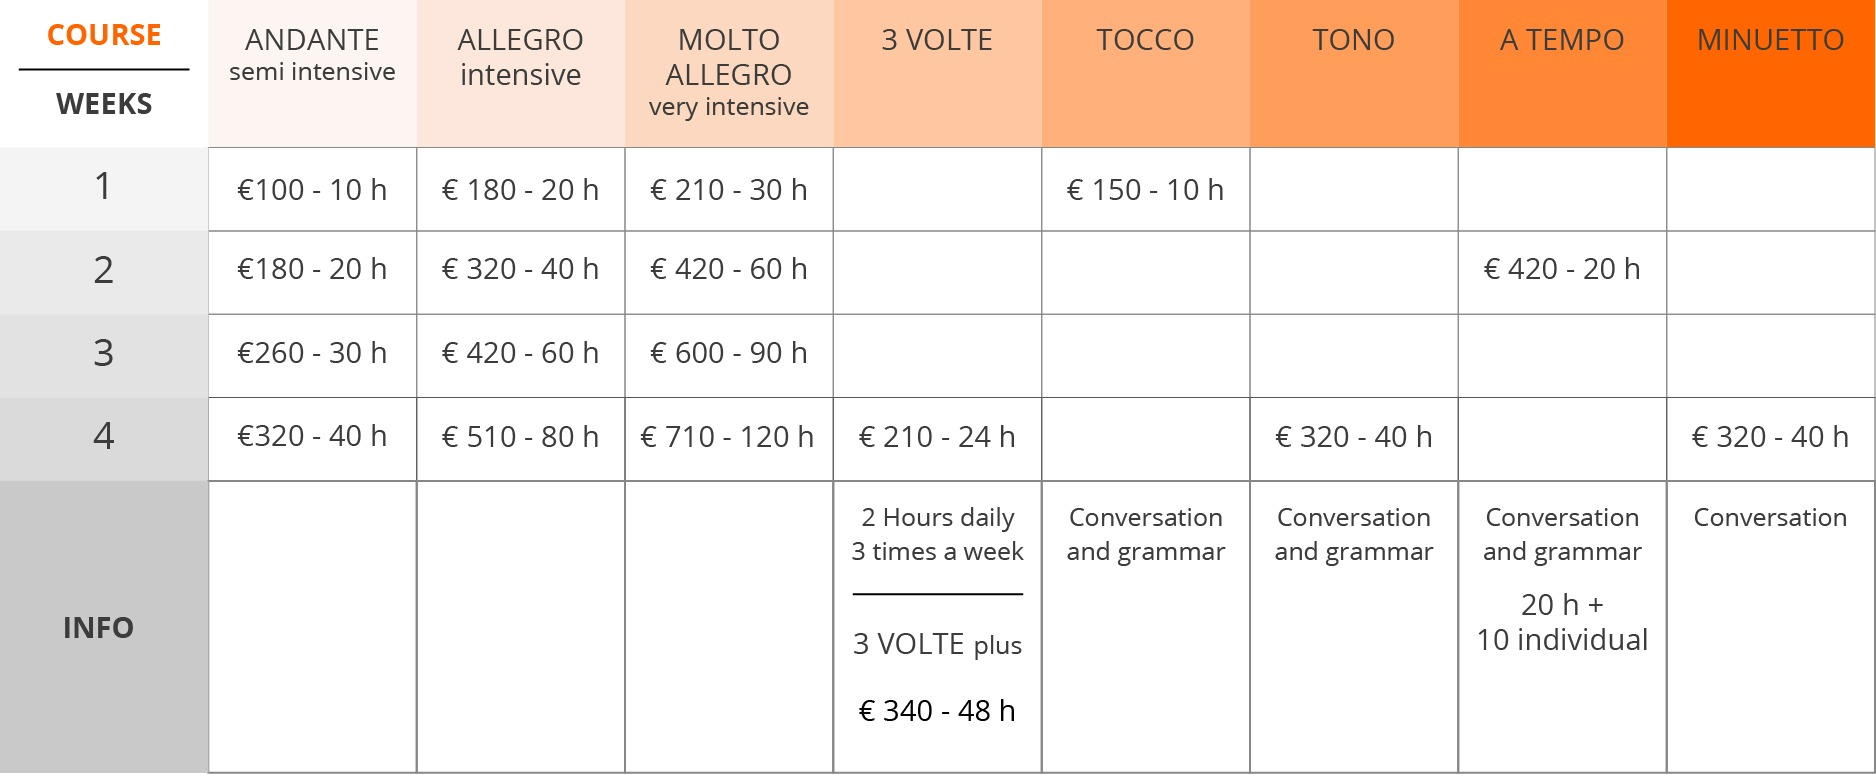 tabella prezzi parola1 01 - 课程介绍